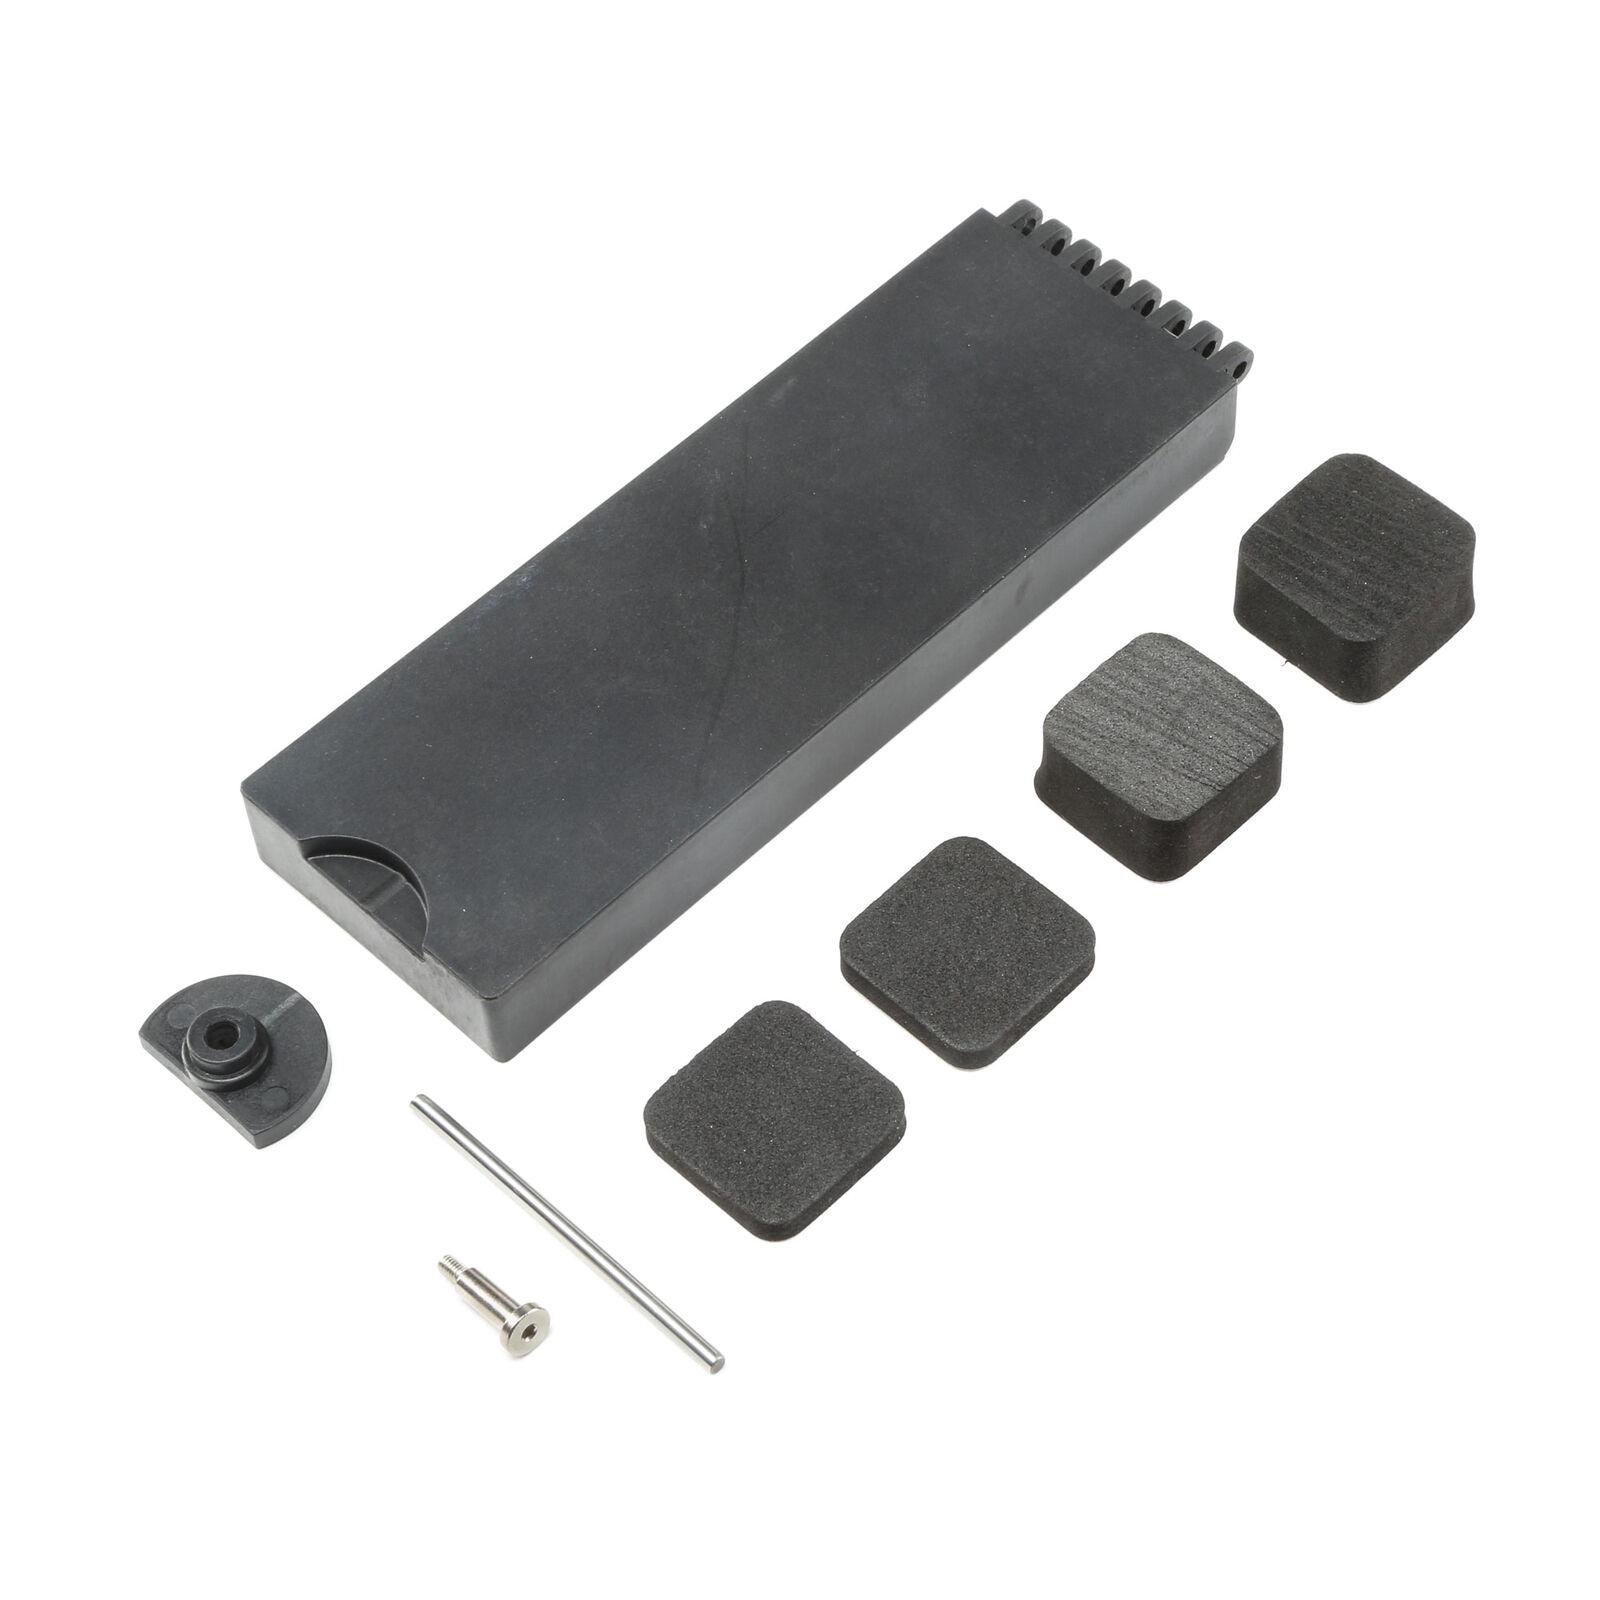 TENACITY SCT - Boitier batterie